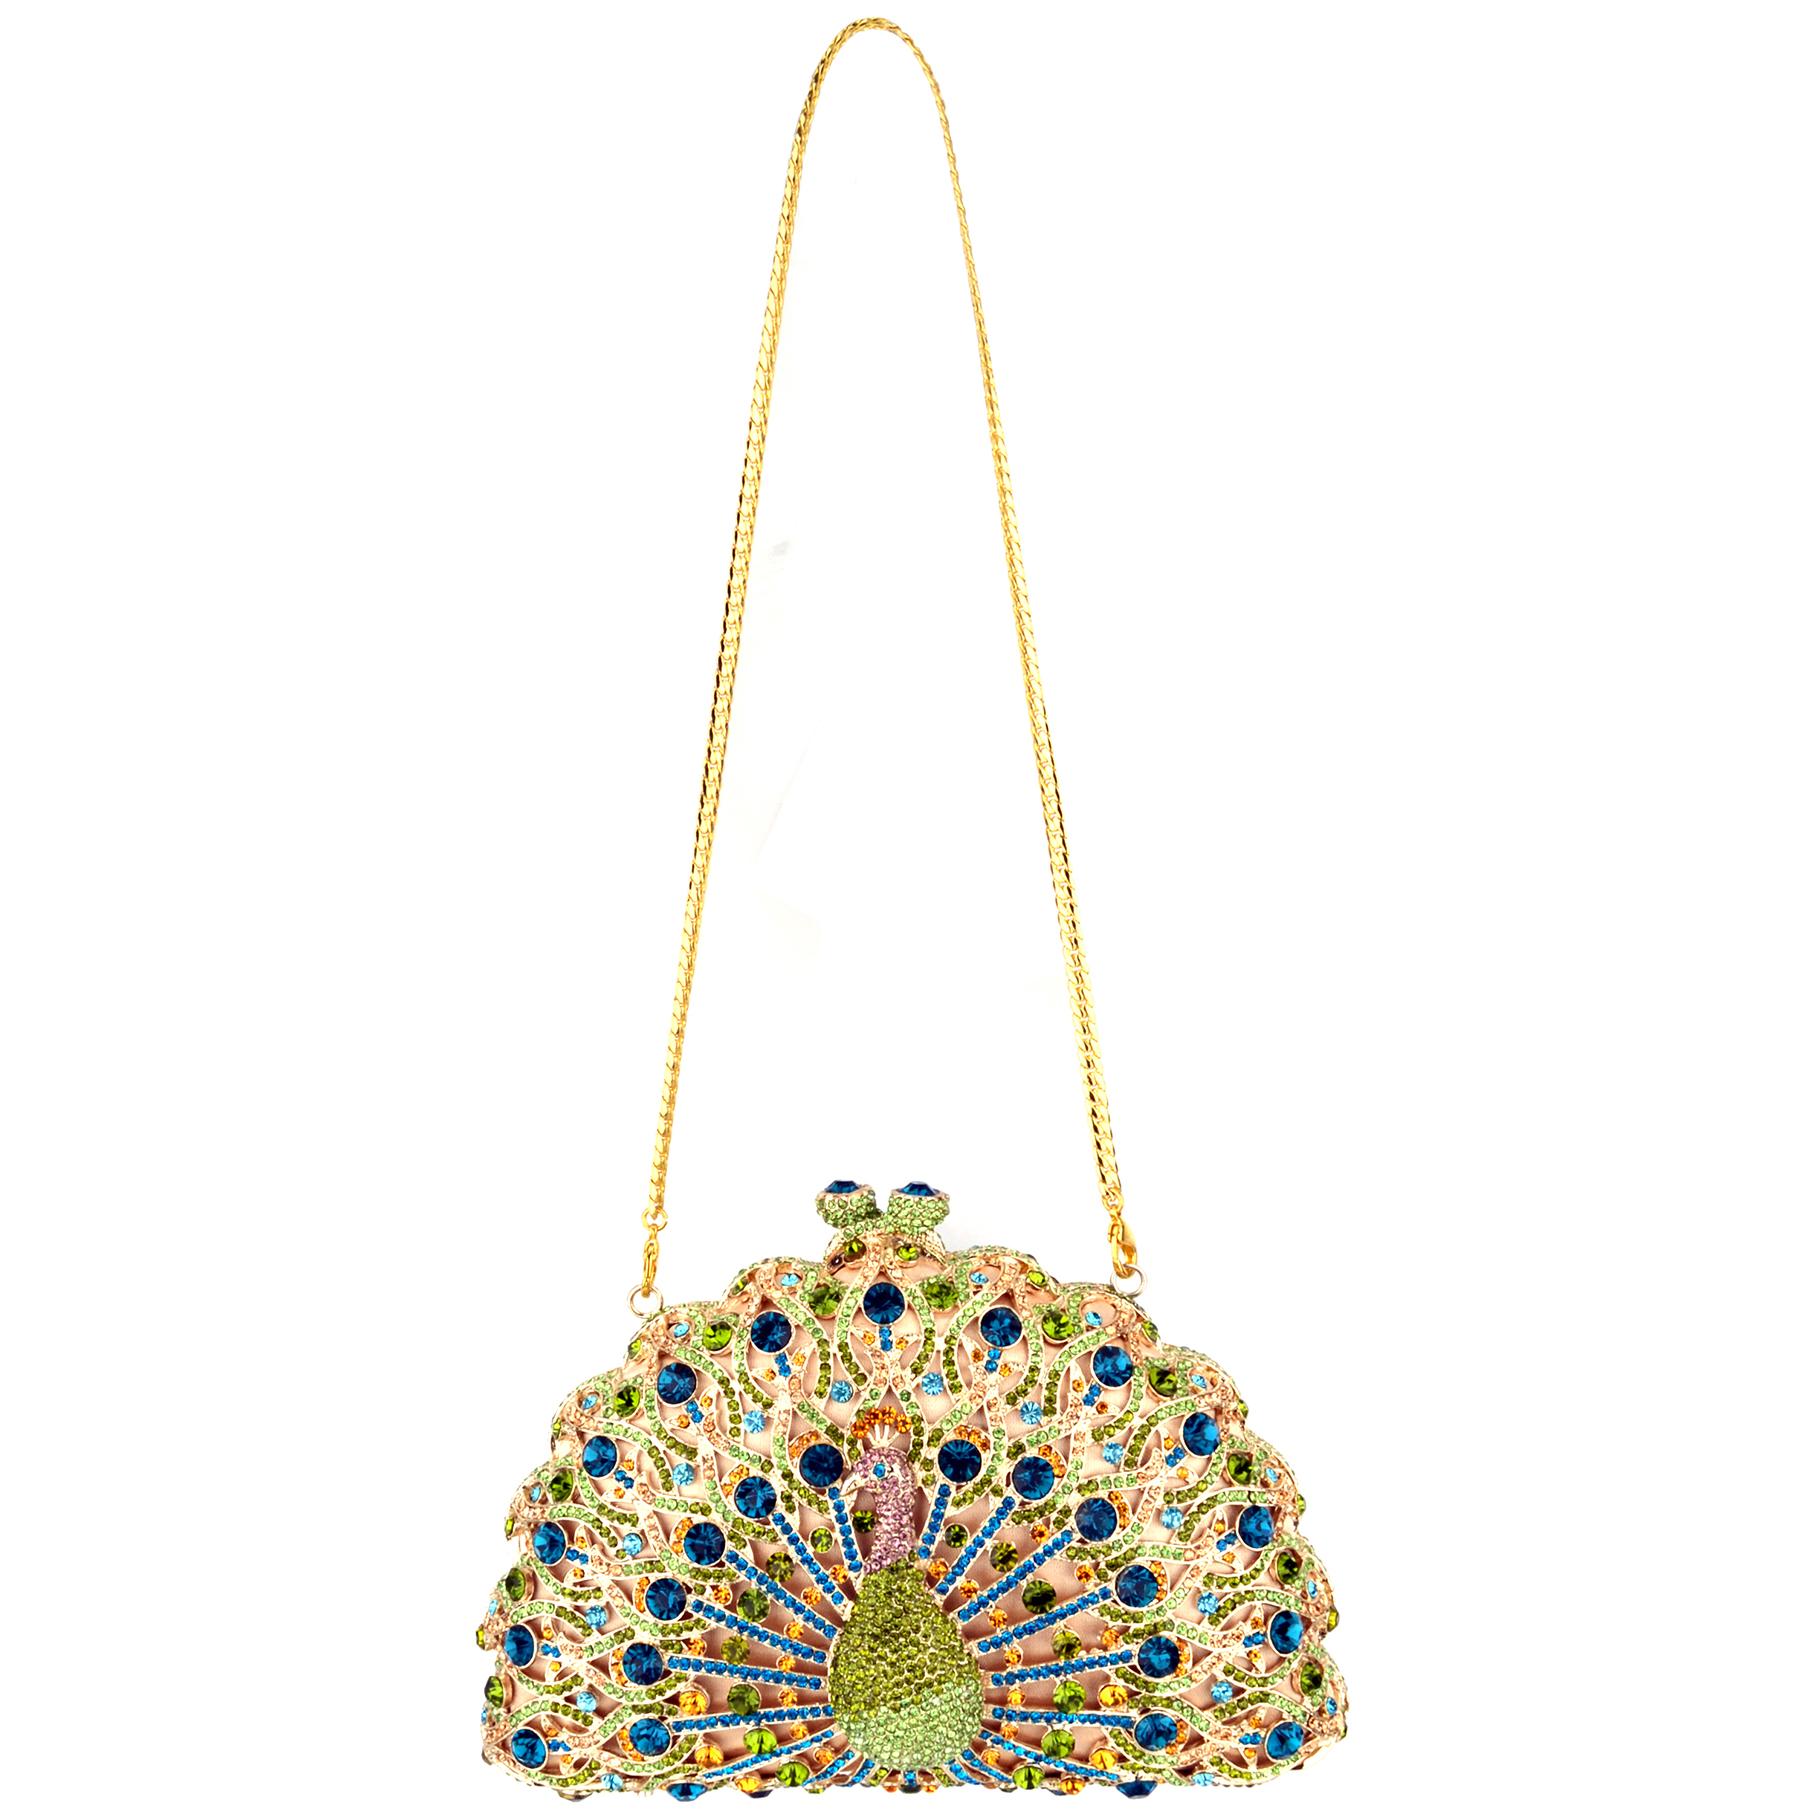 CLARA Green Crystal Peacock Evening Bag strap